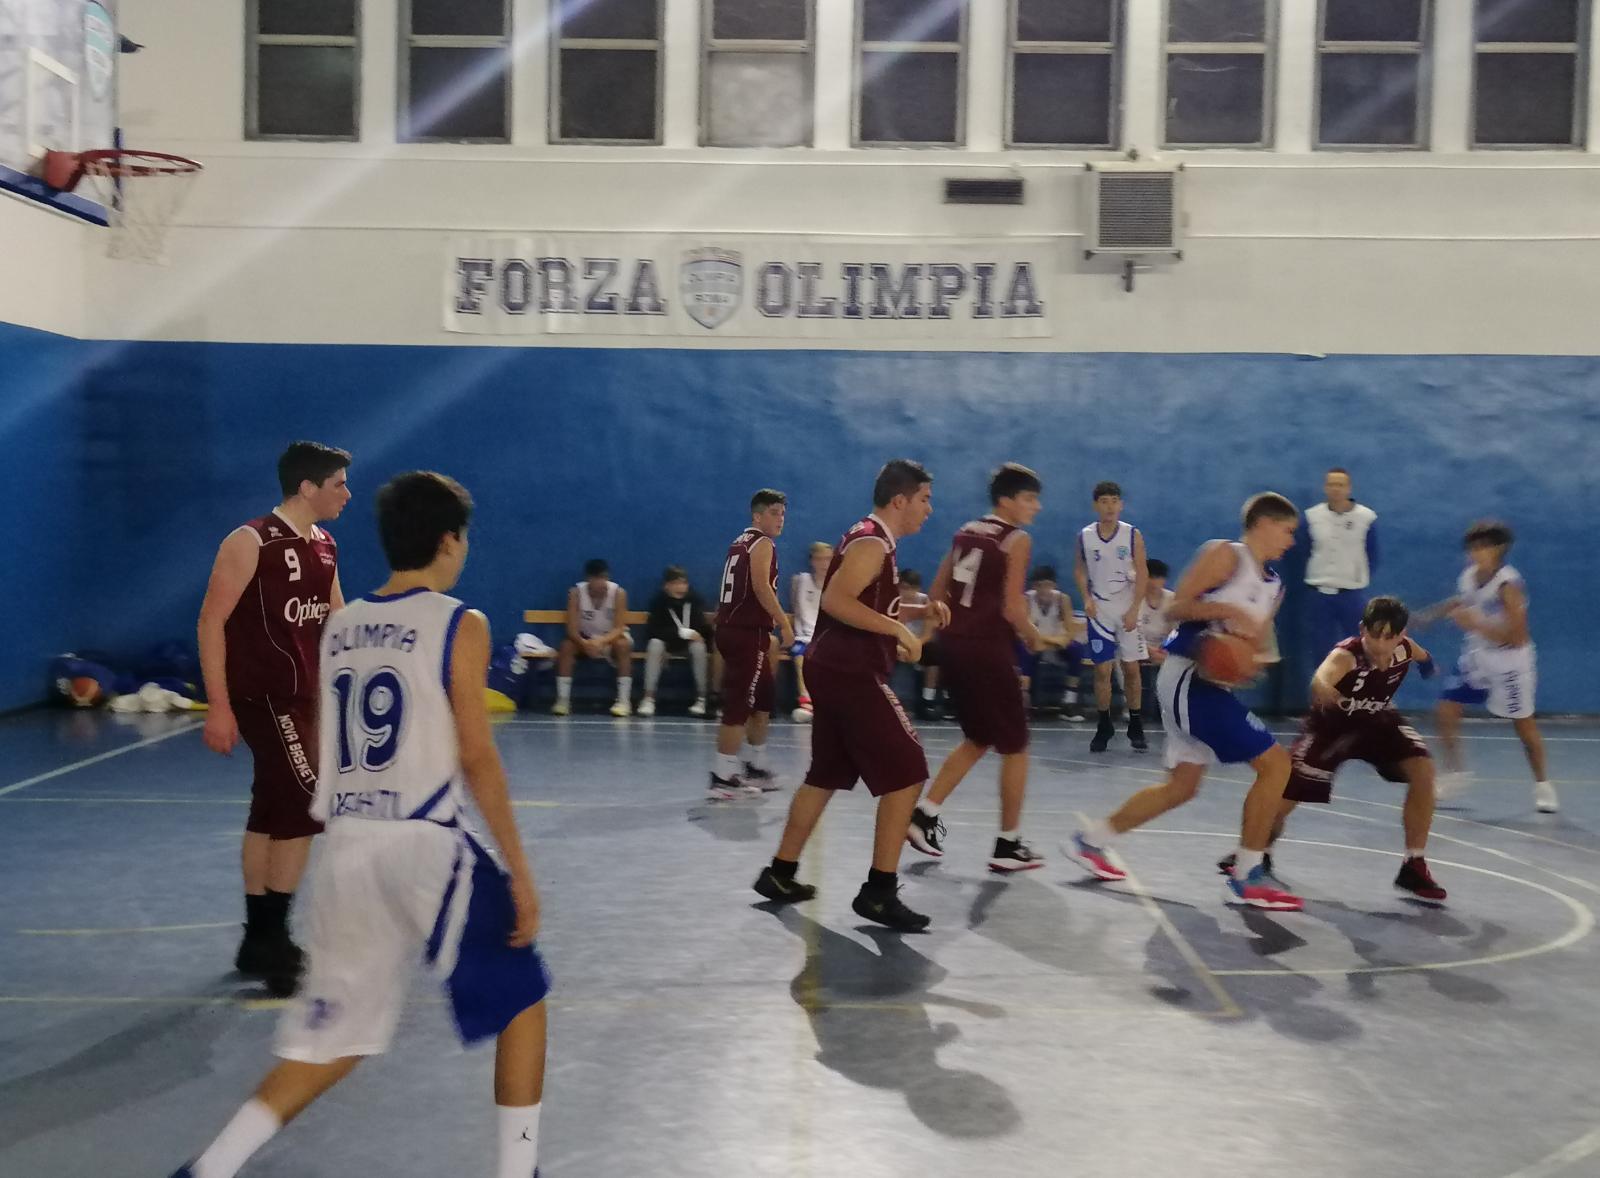 U16S Olimpia Roma - Nova Bk Ciampino 75-48 20